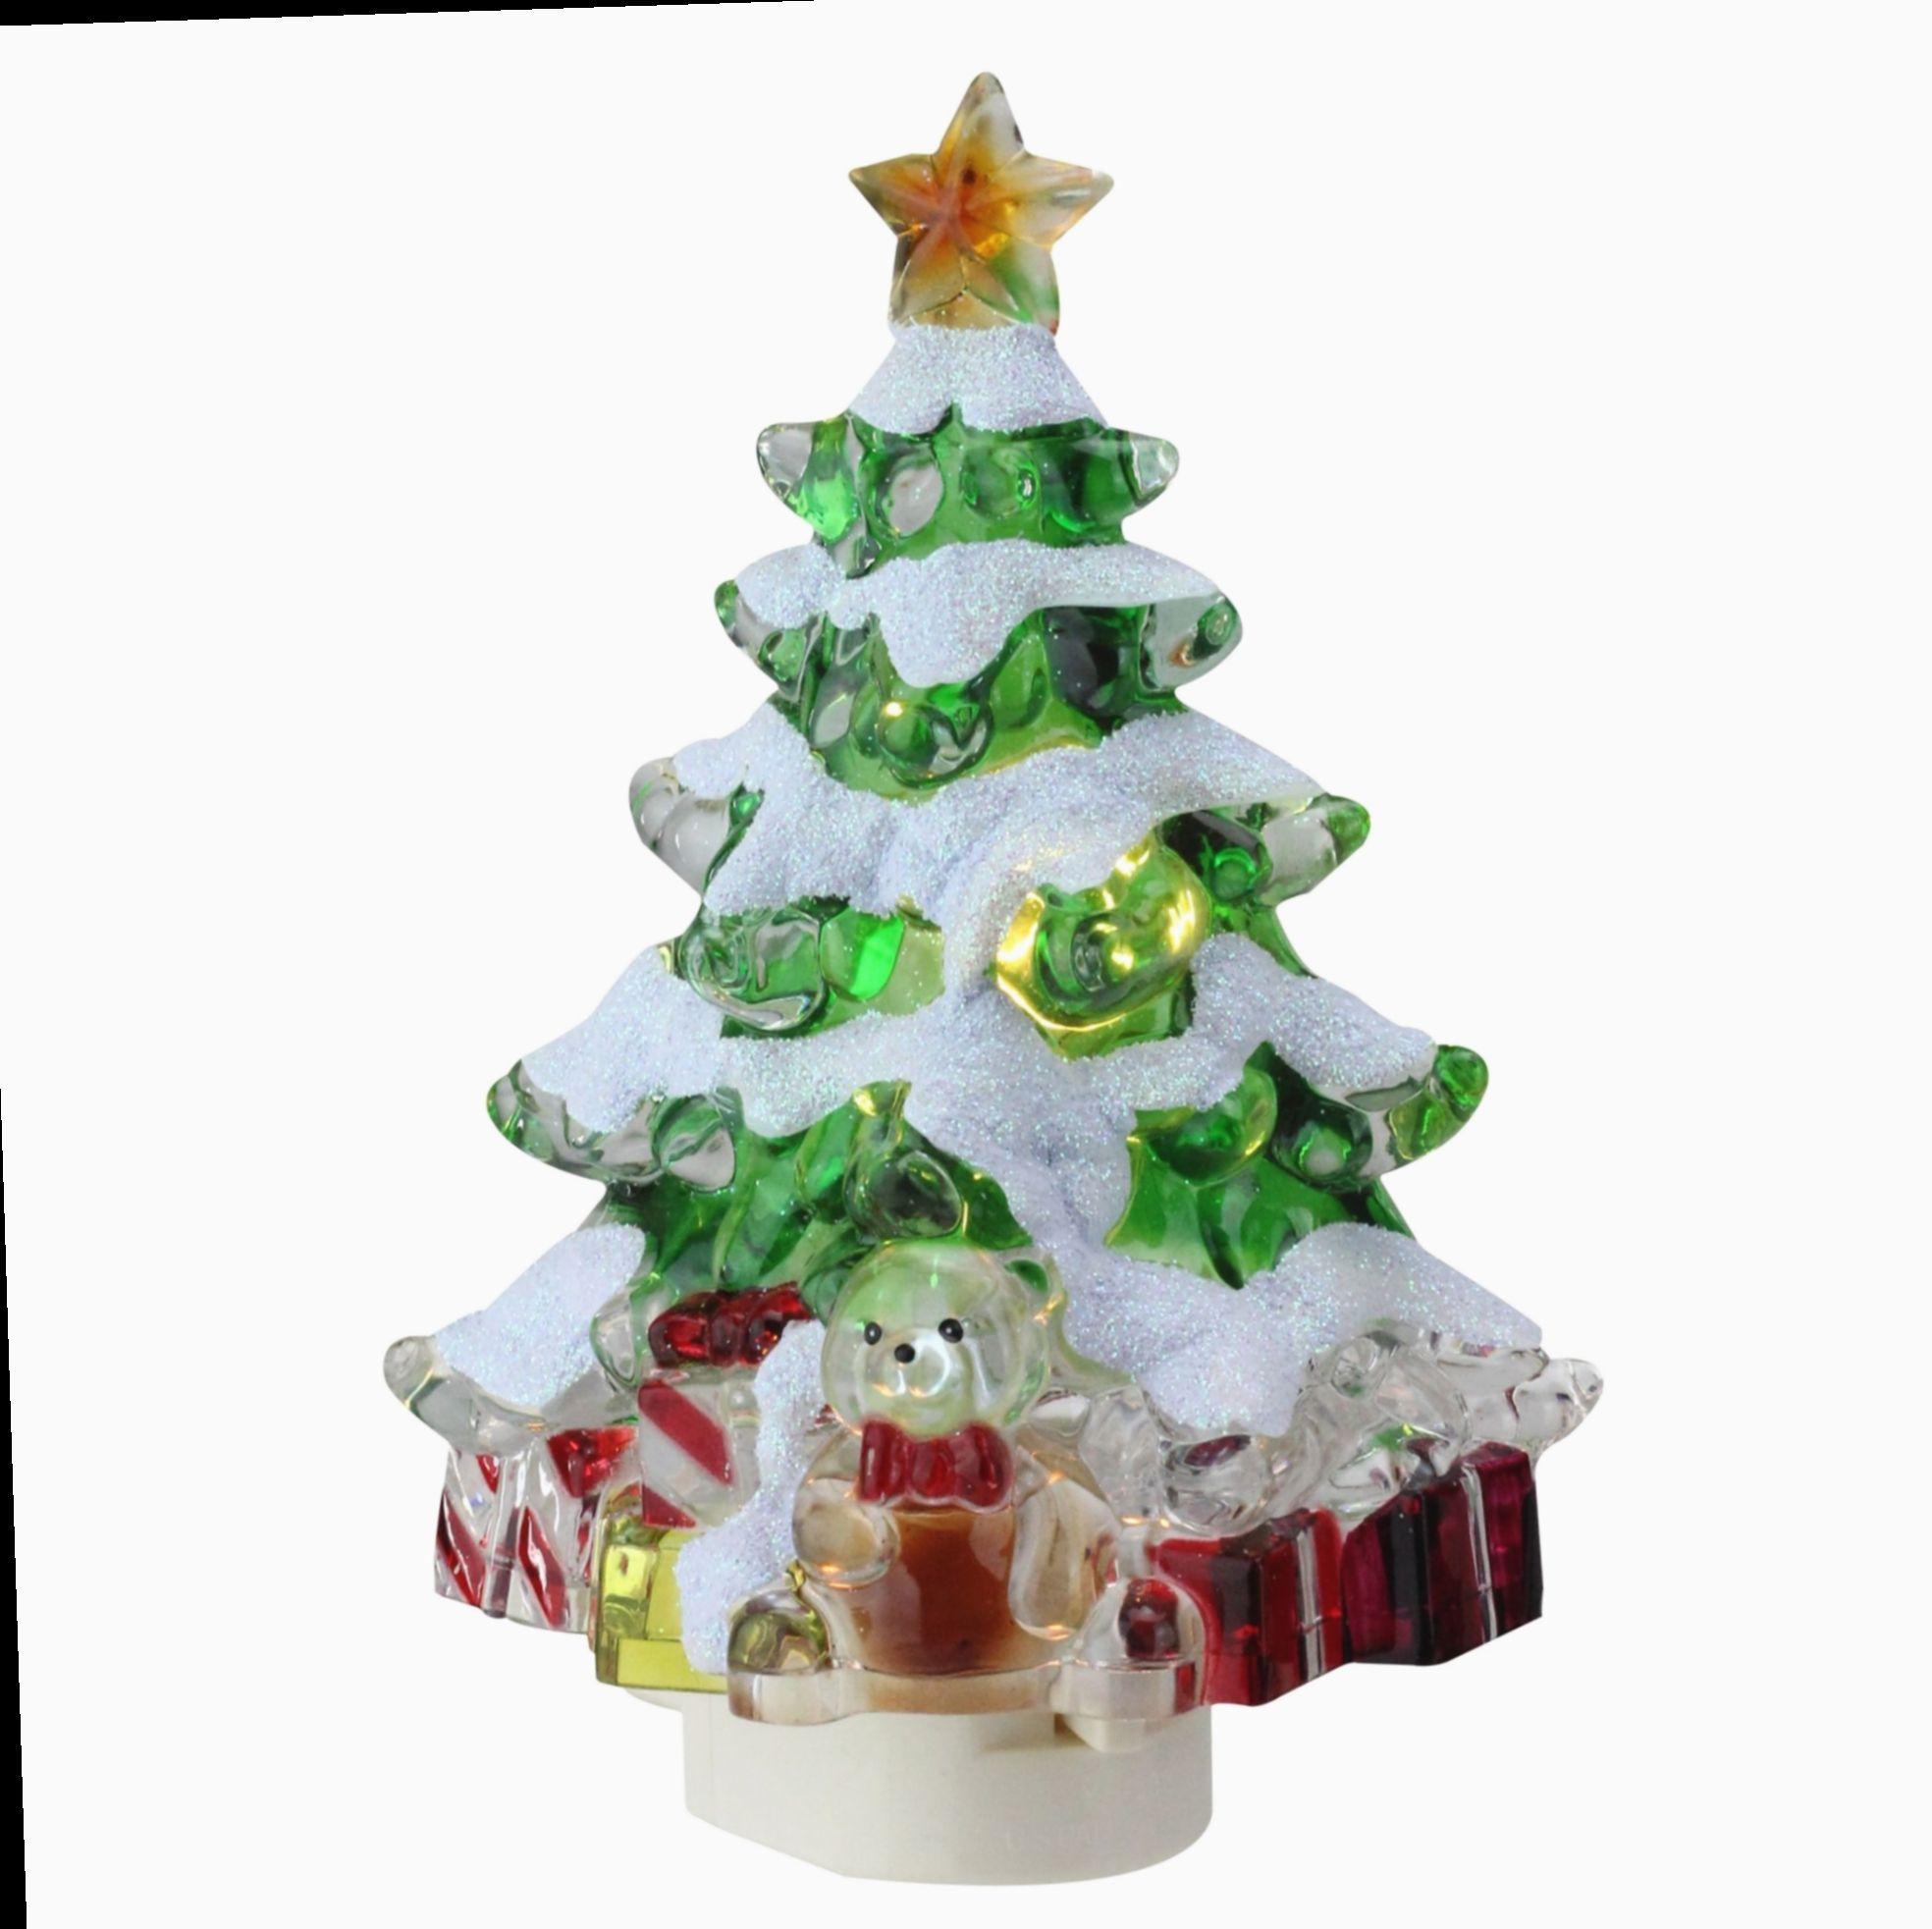 Christmas Eve Porcelain Figurine Decorative Night Light by Appletree